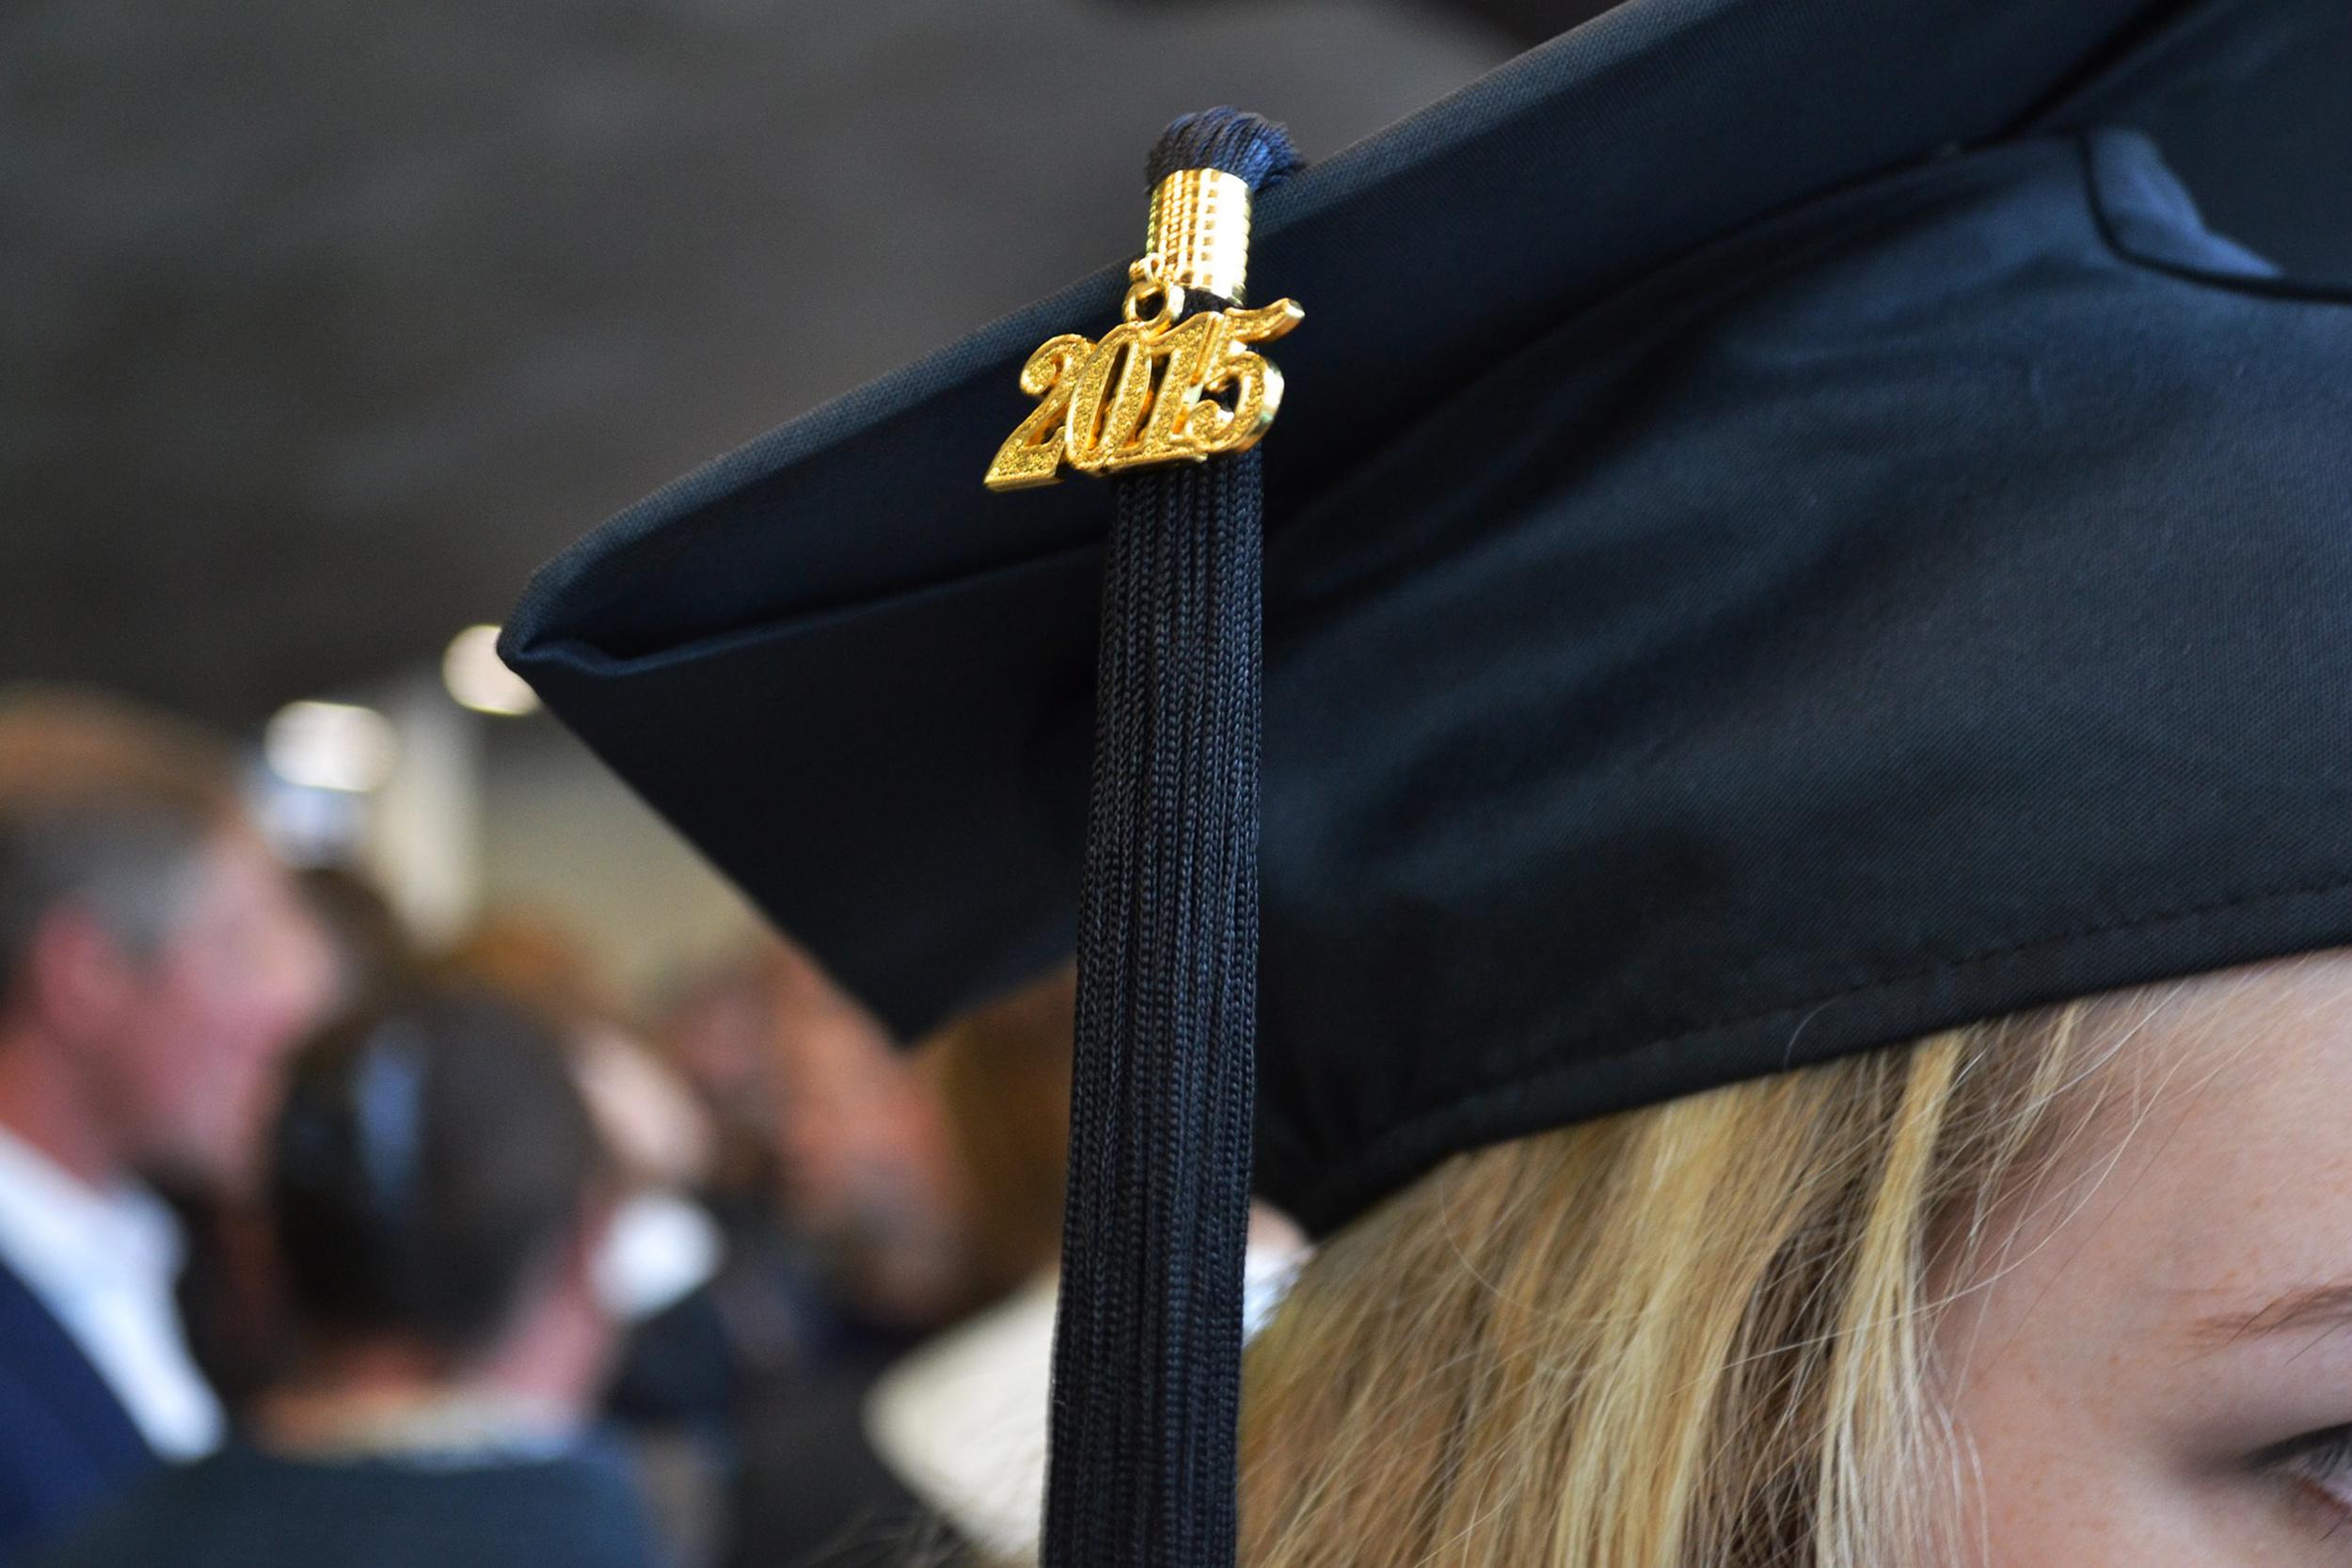 London Graduation Photography - hat